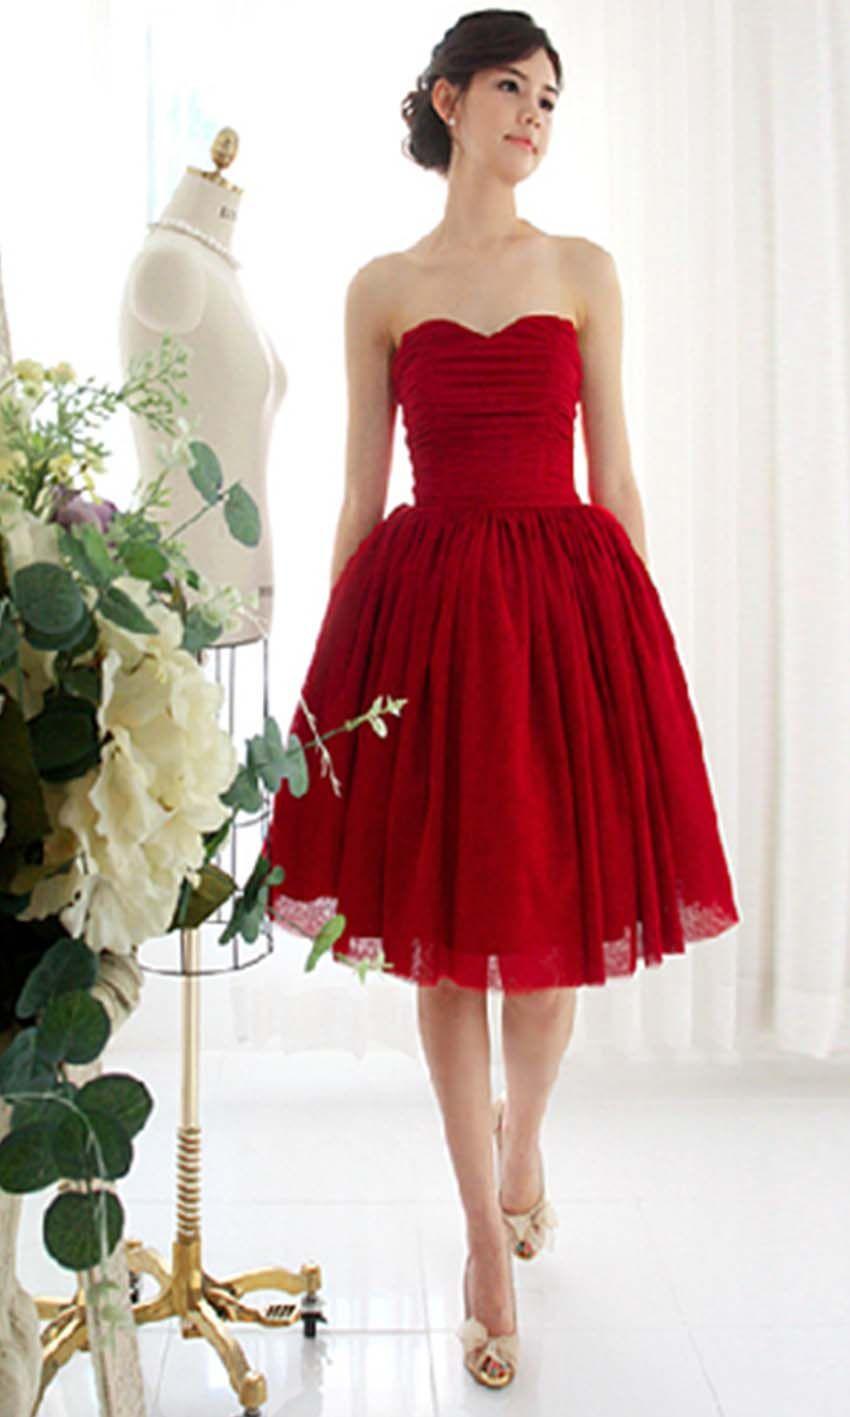 Red sweetheart short bridesmaid richias wedding pinterest red sweetheart short bridesmaid ombrellifo Images